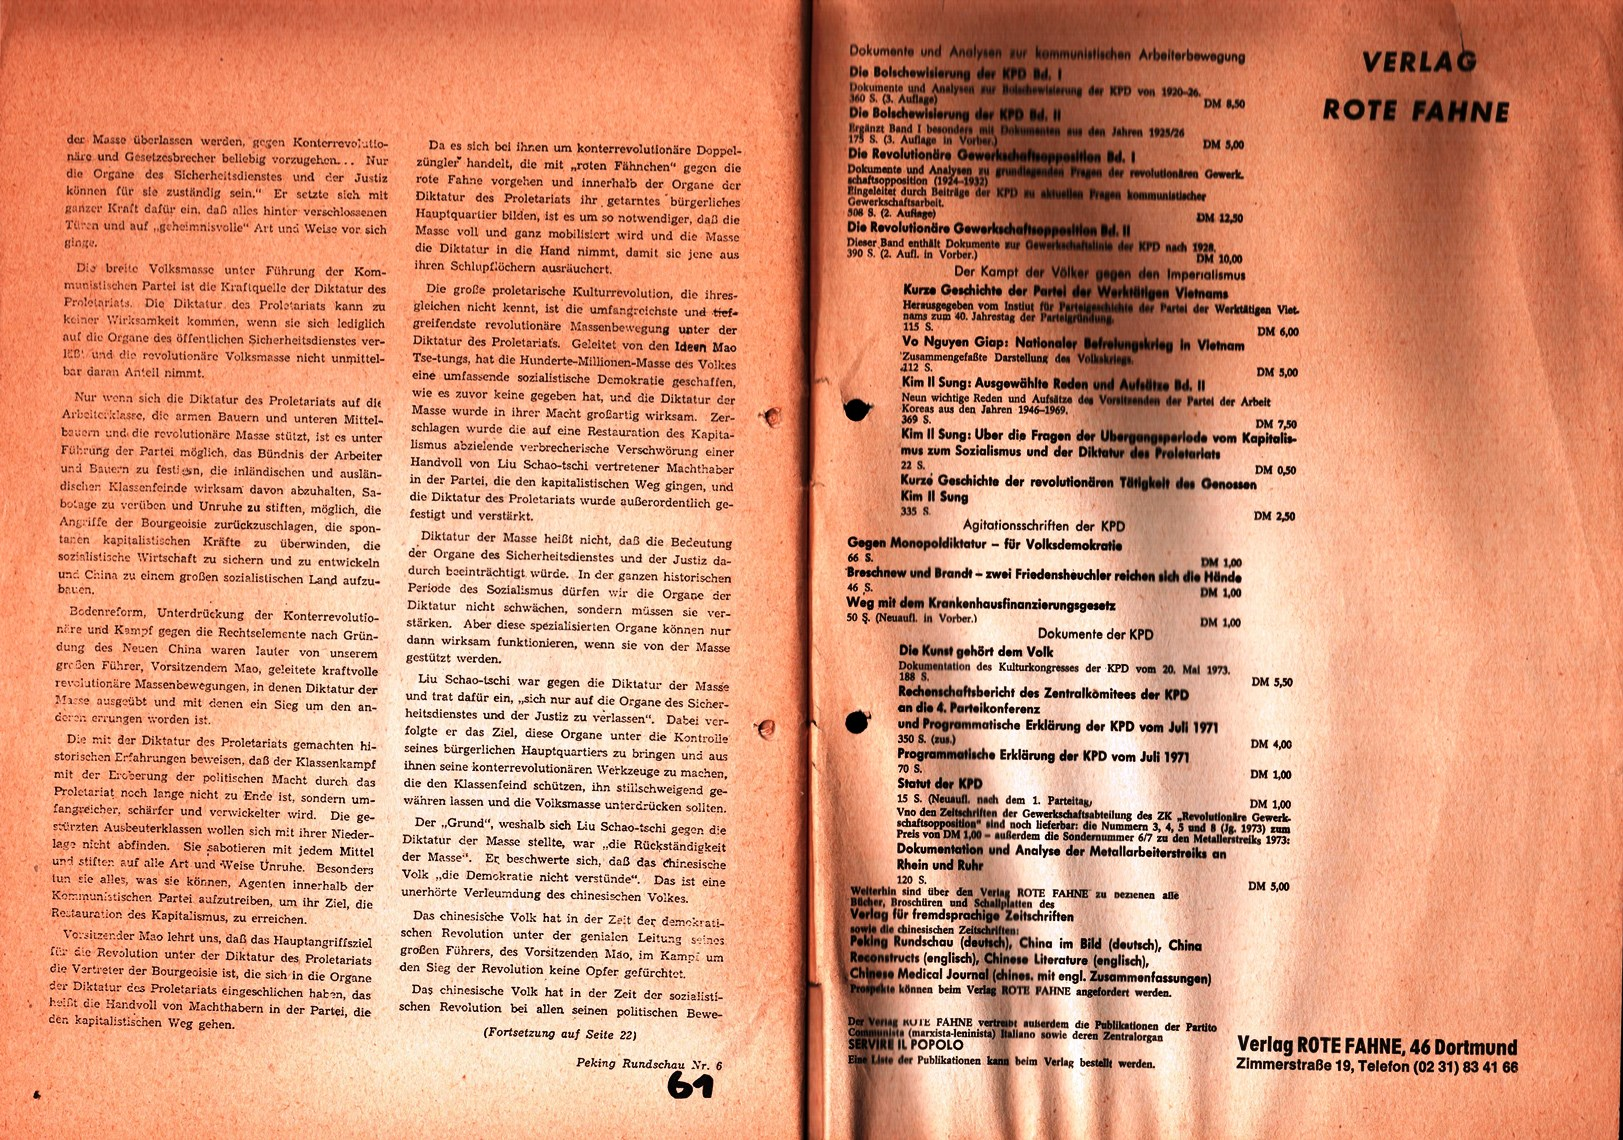 KSV_1974_Materialien_zur_Programmdiskussion_01_032